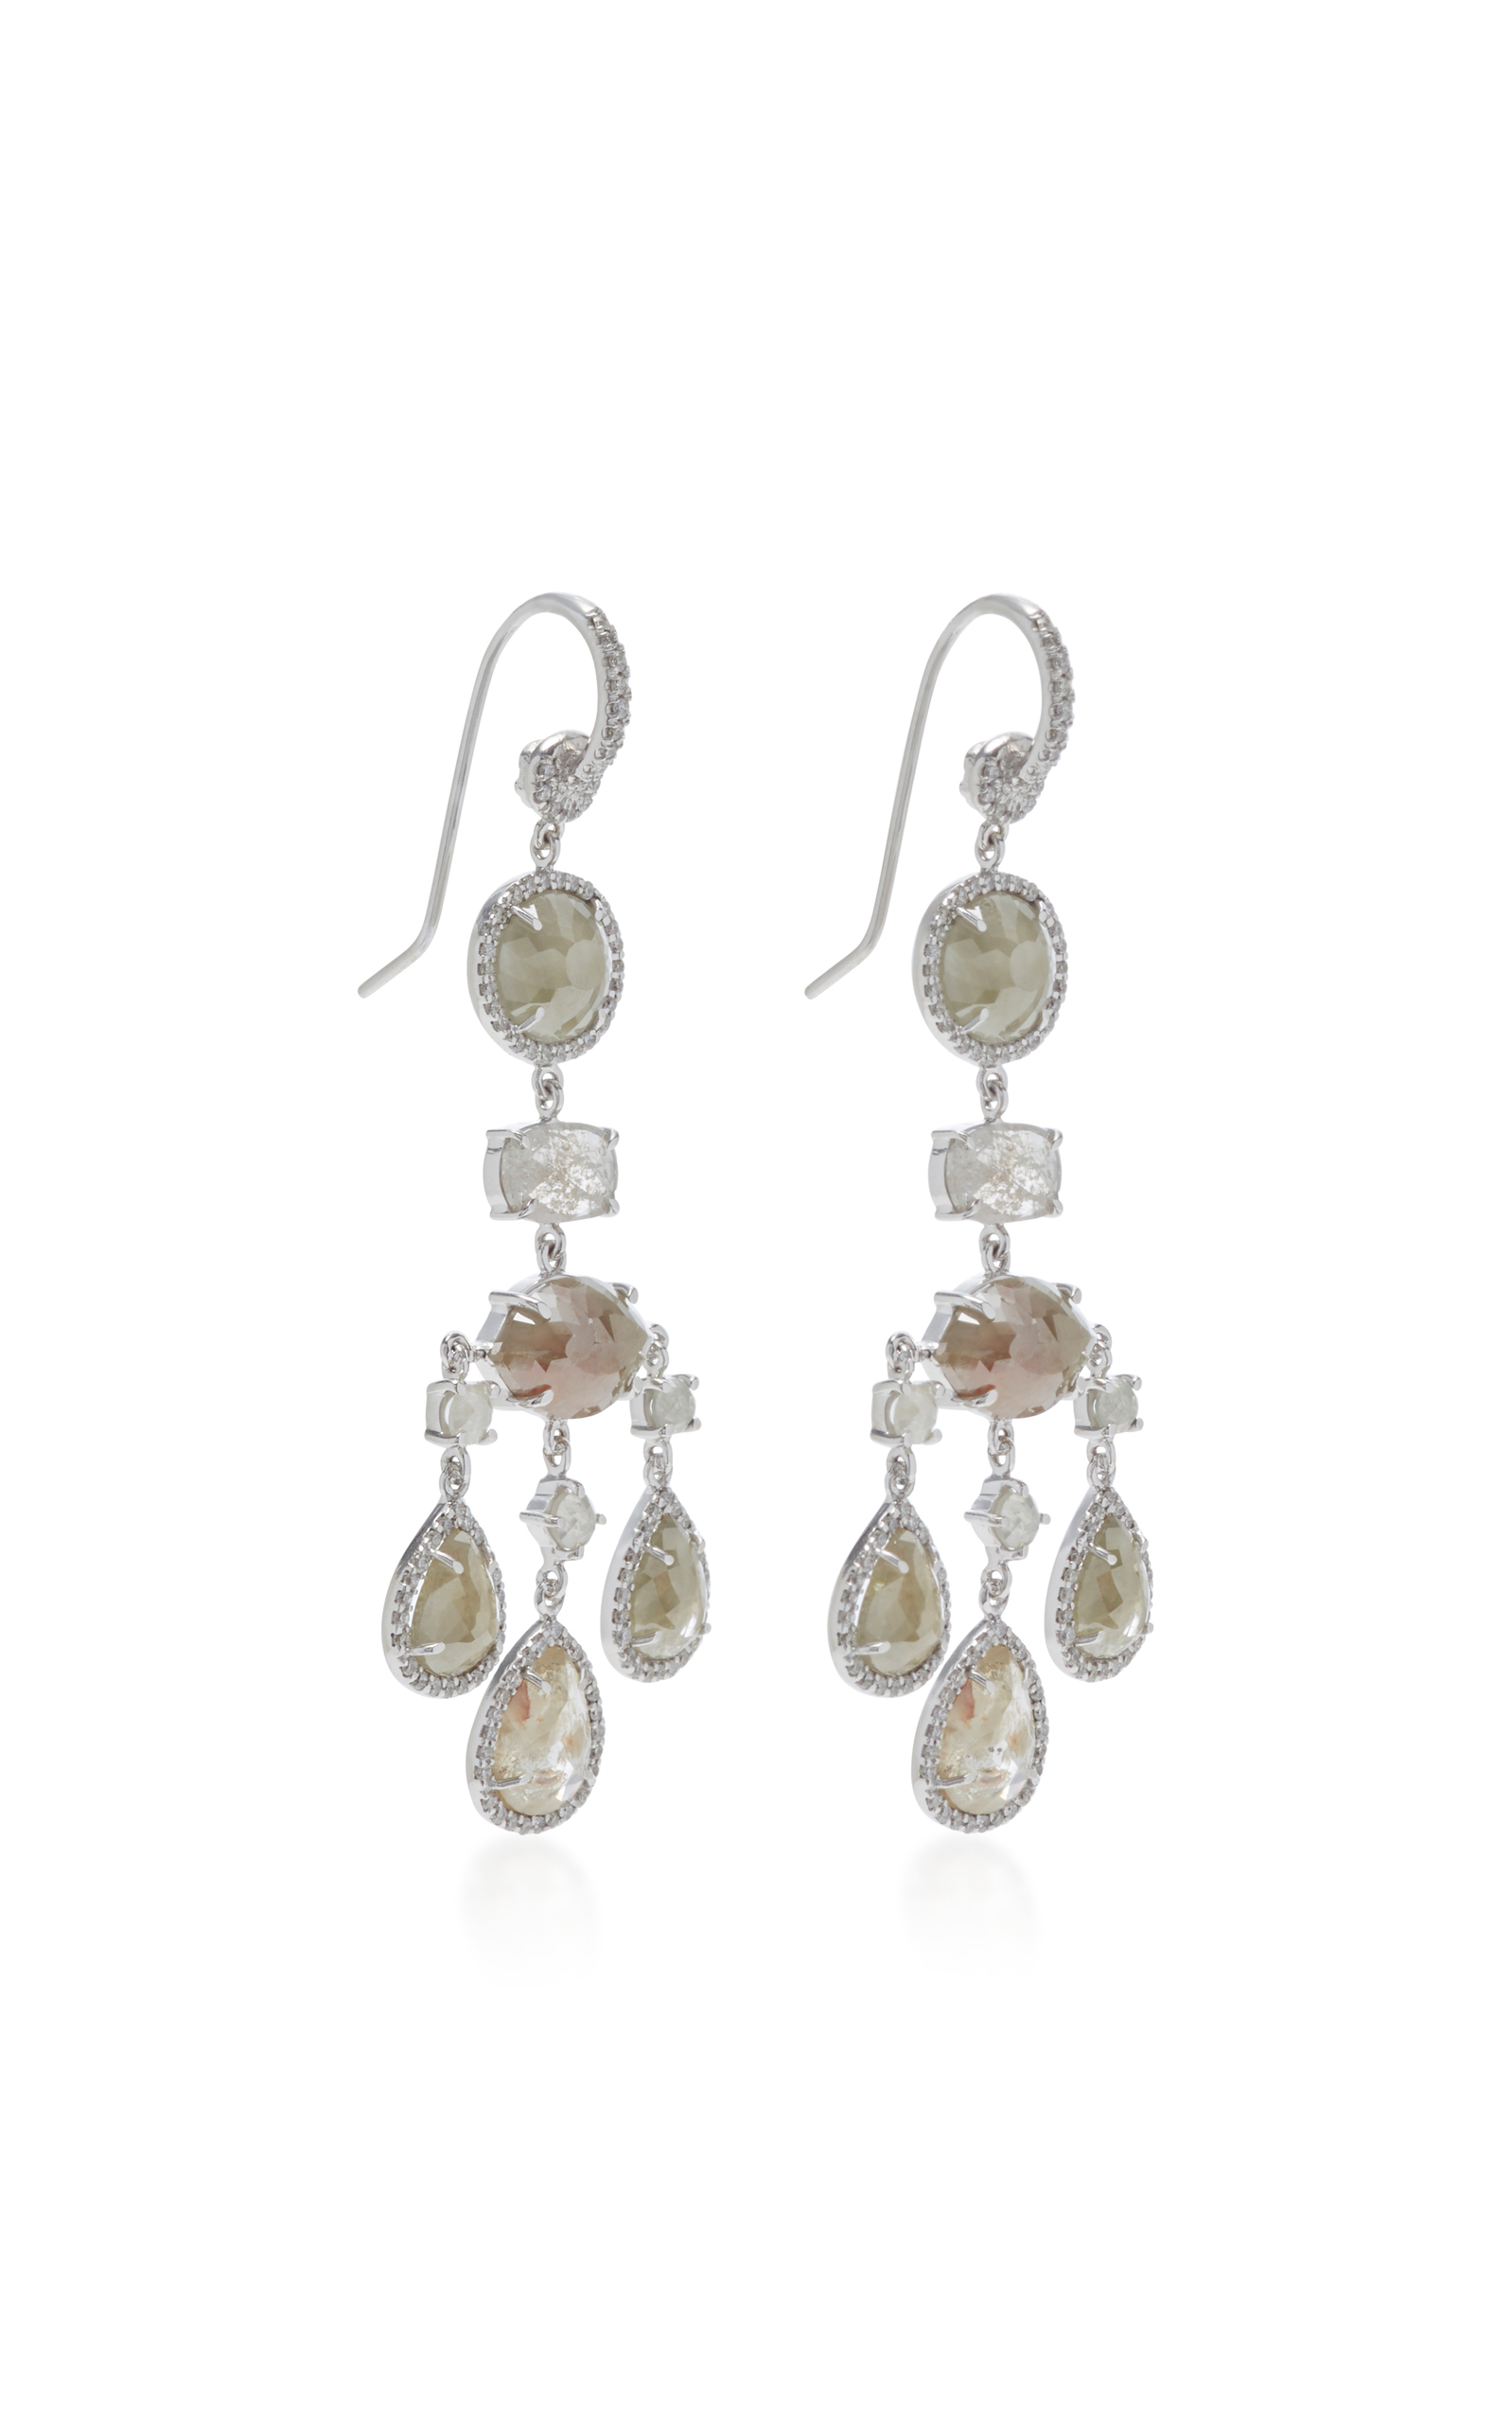 18K White Gold and Diamond Chandelier Earrings by Nina | Moda Operandi